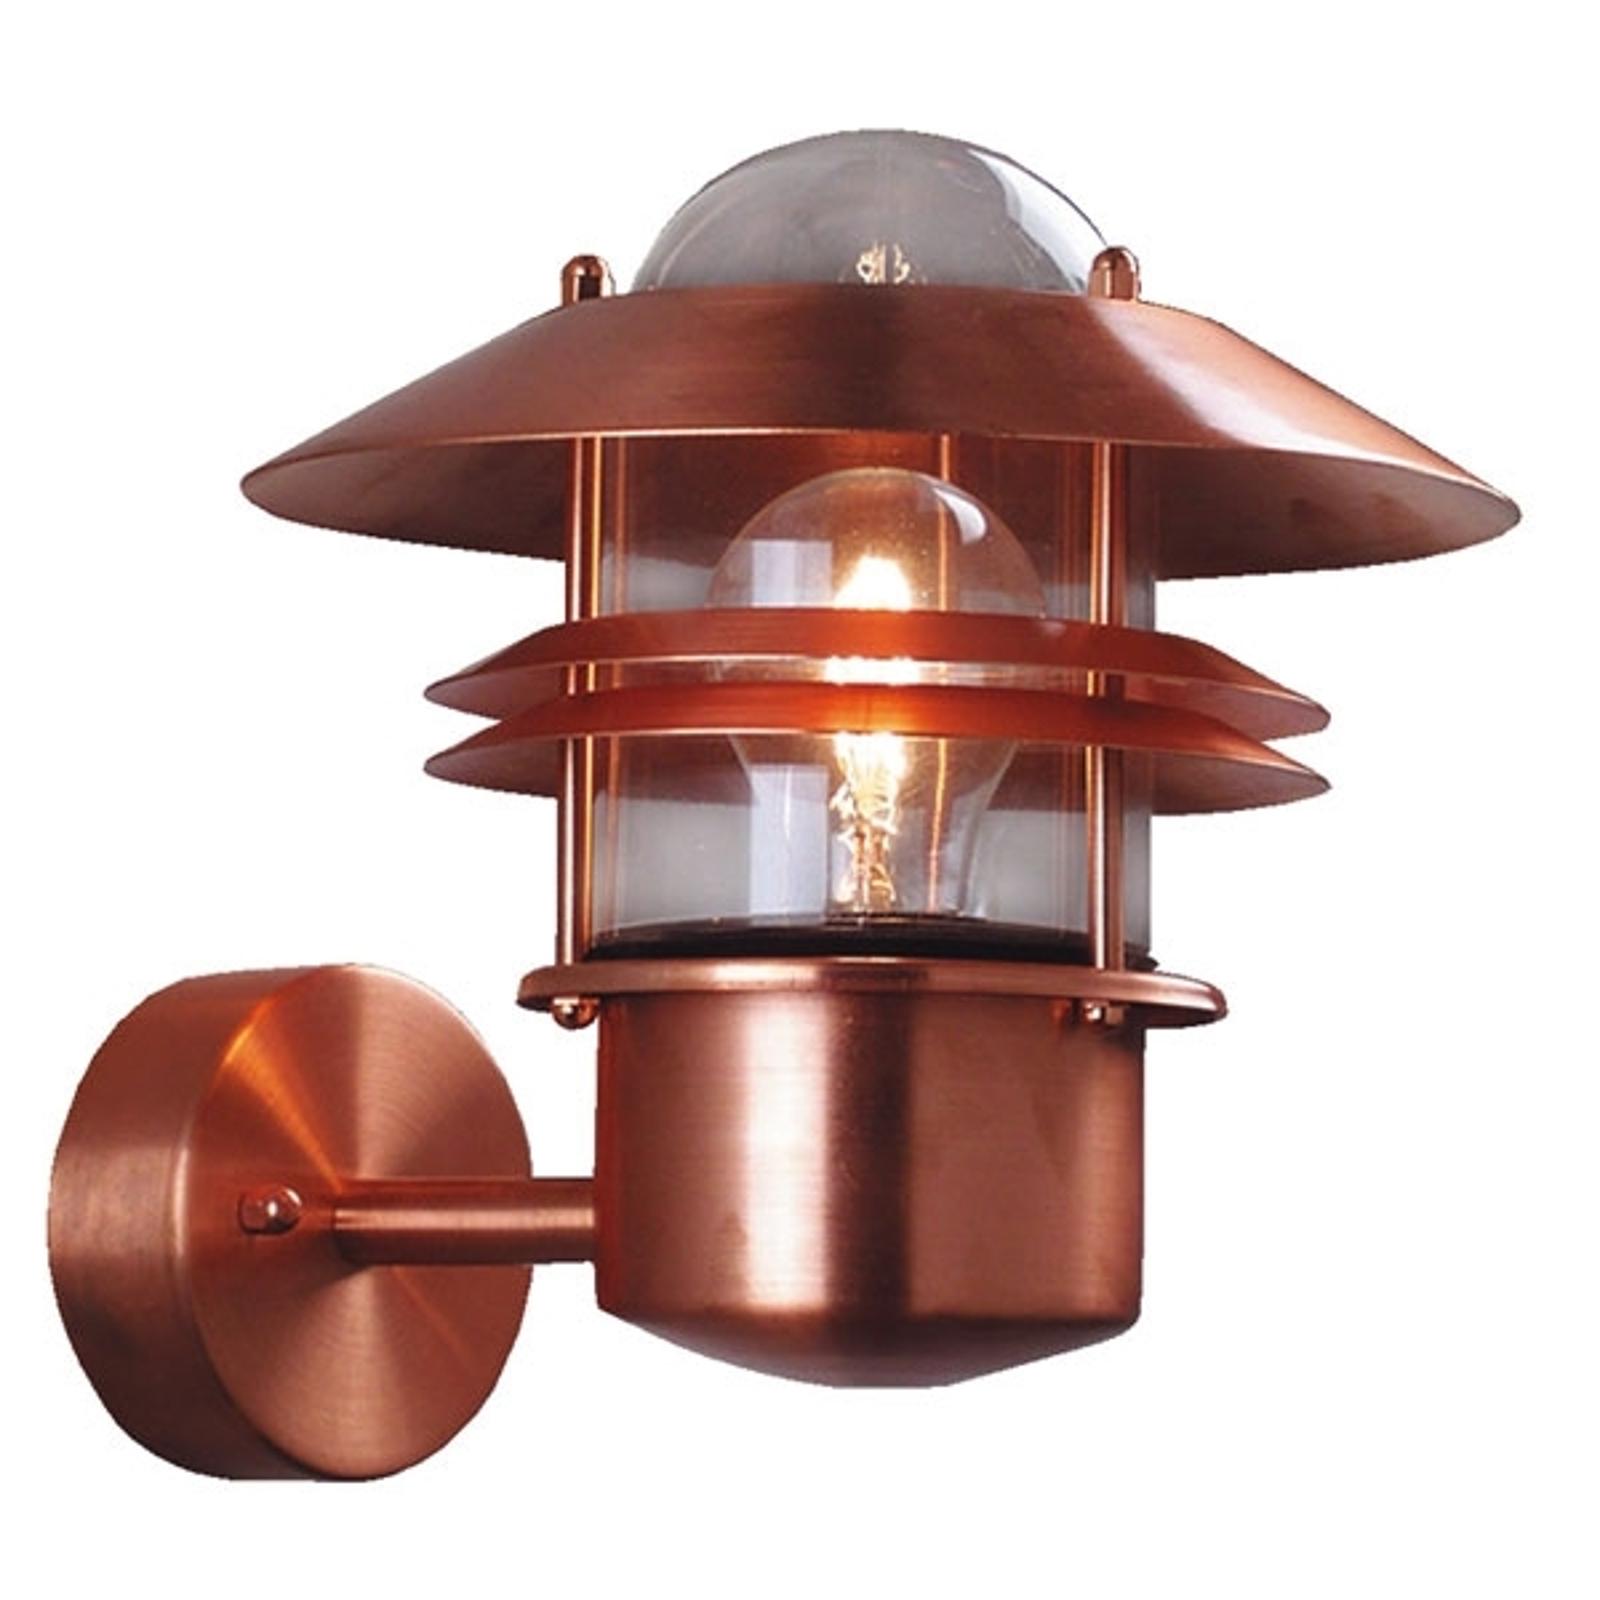 Koperkleurige wandlamp BLOKHUS